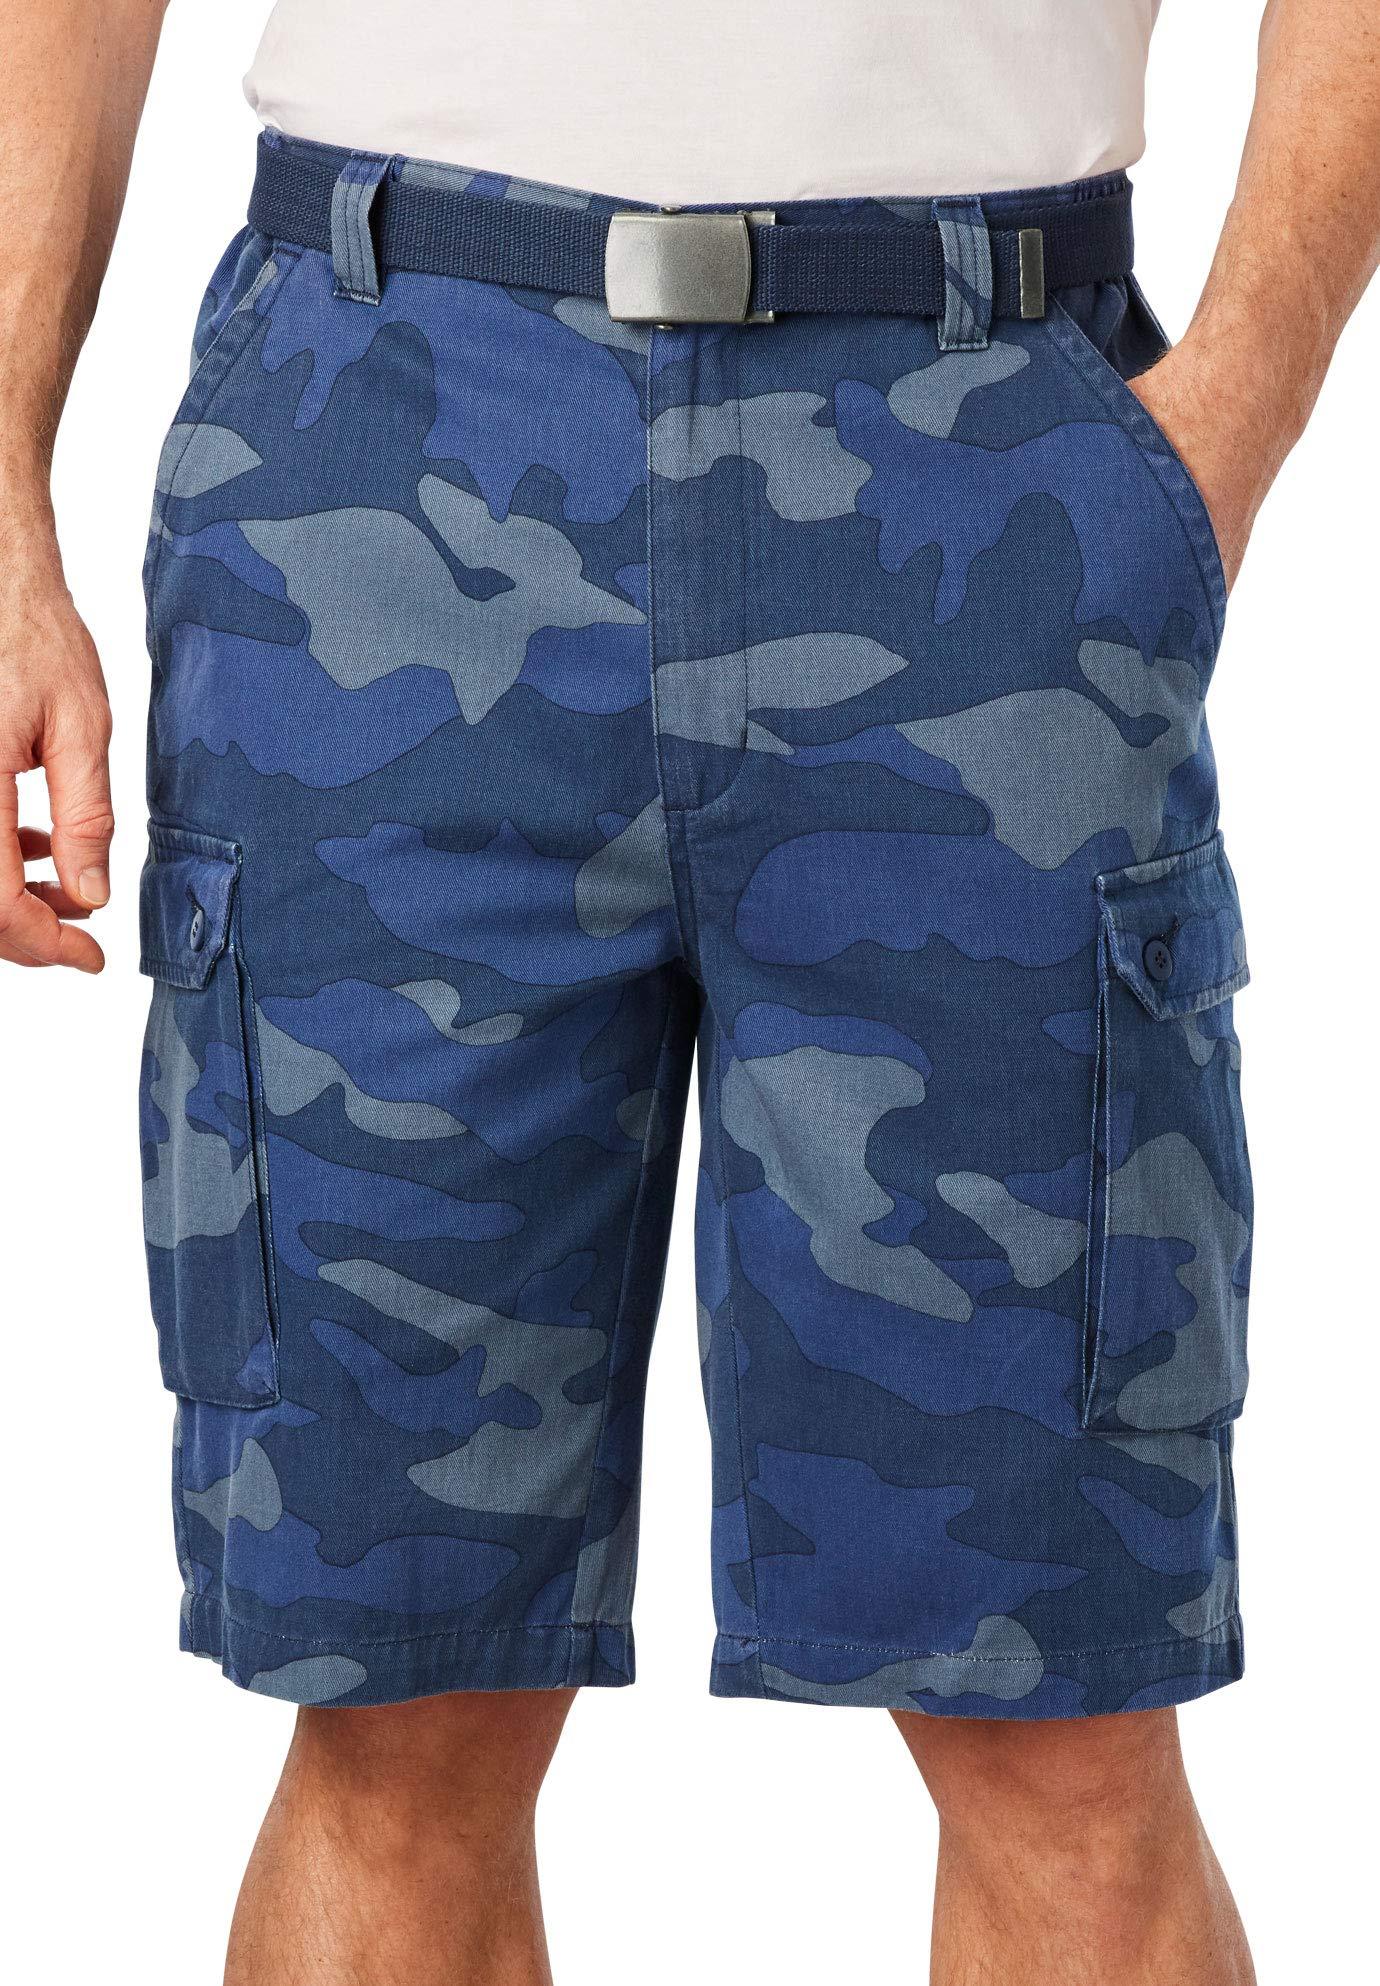 KingSize Men's Big & Tall 12'' Side Elastic Cargo Short with Twill Belt, Blue Camo Tall-4XL